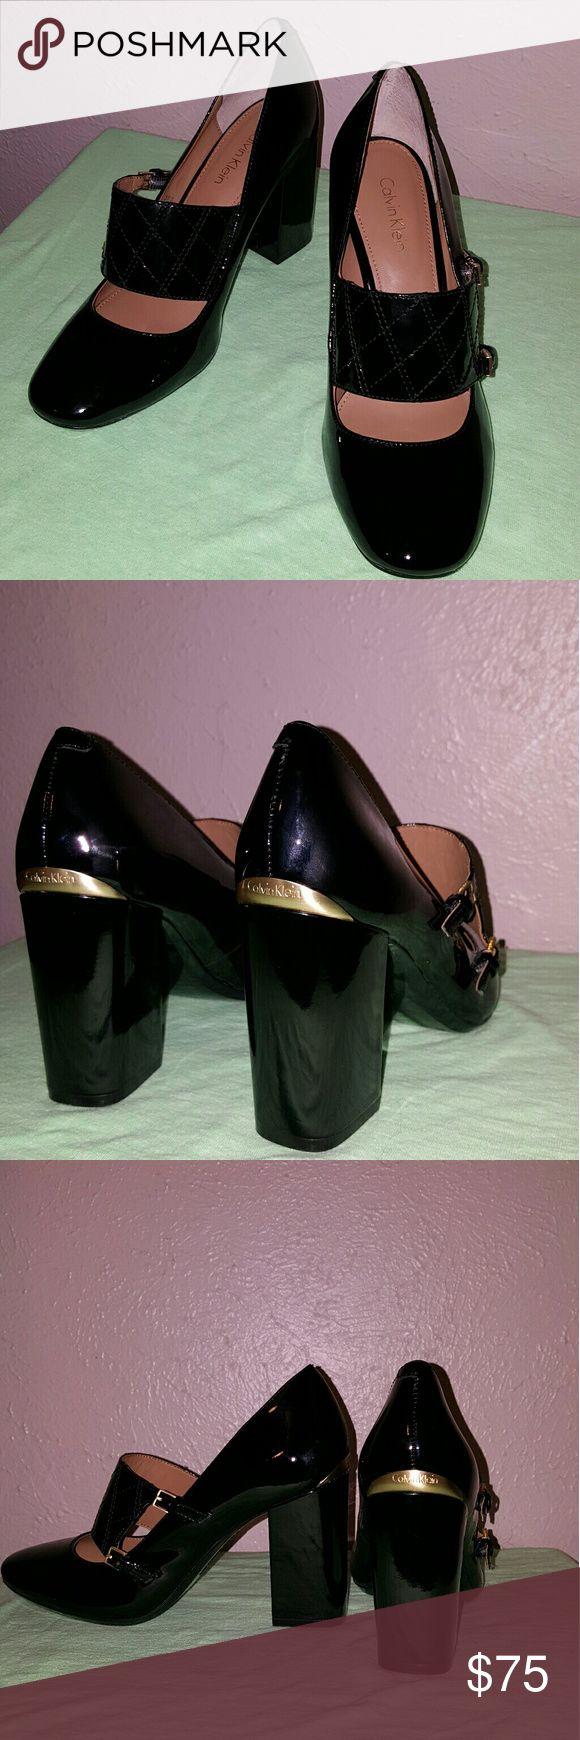 LAST CALL SALE   Calvin Klein. Calvin Klein size US6,5 new but no a tag. Calvin Klein Shoes